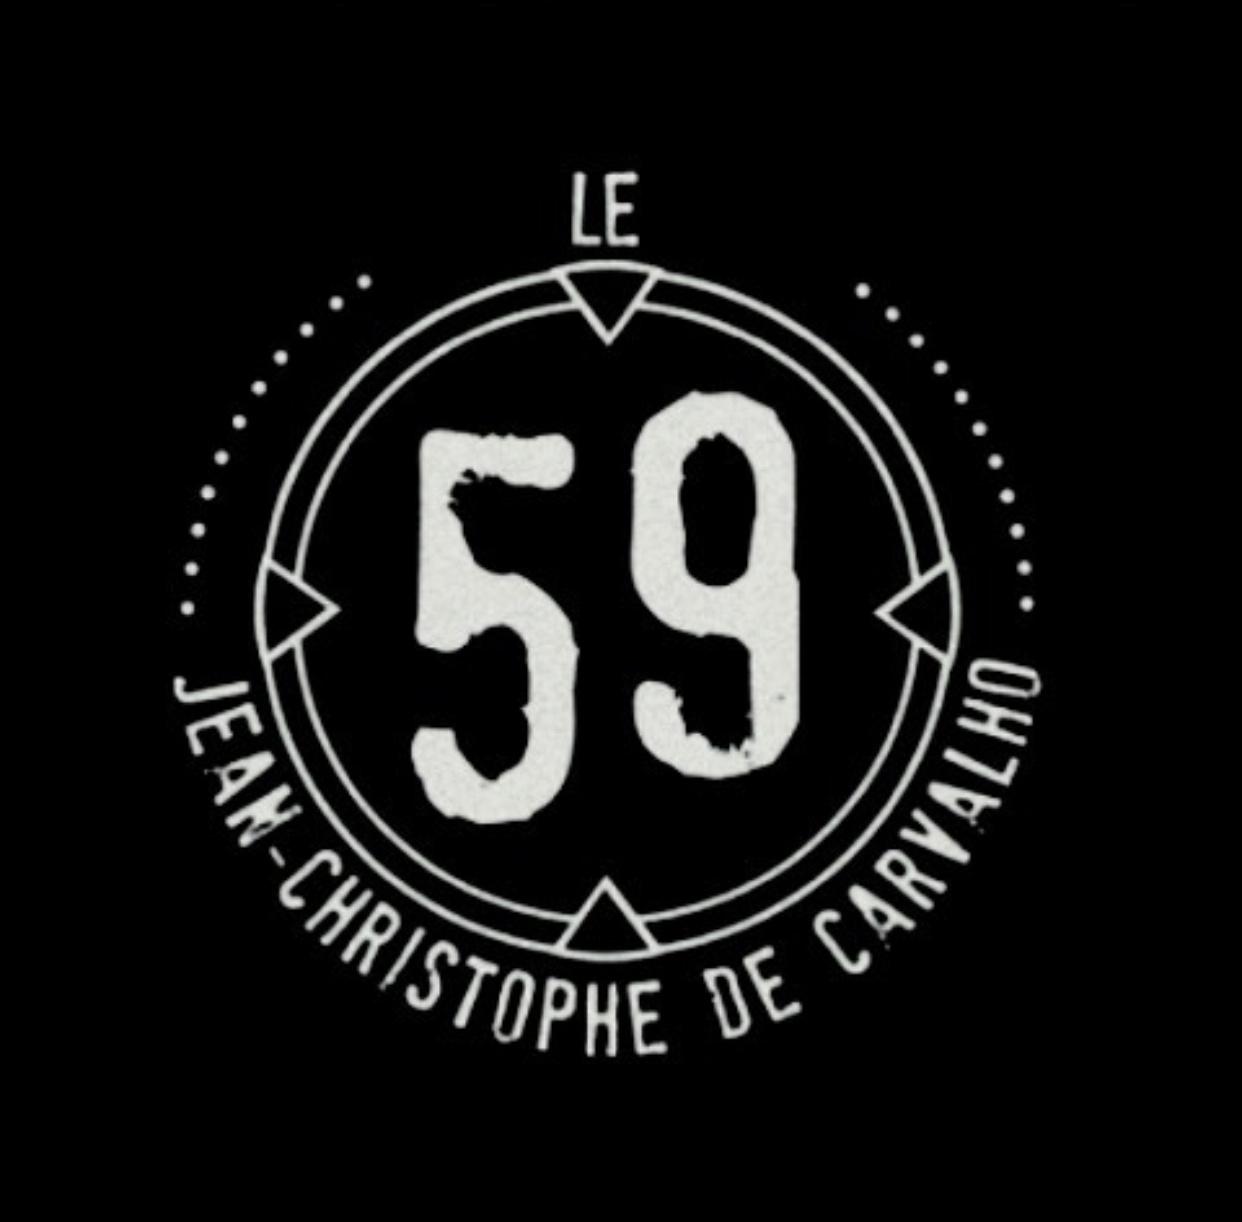 Le 59 JCDC - Rambuteau